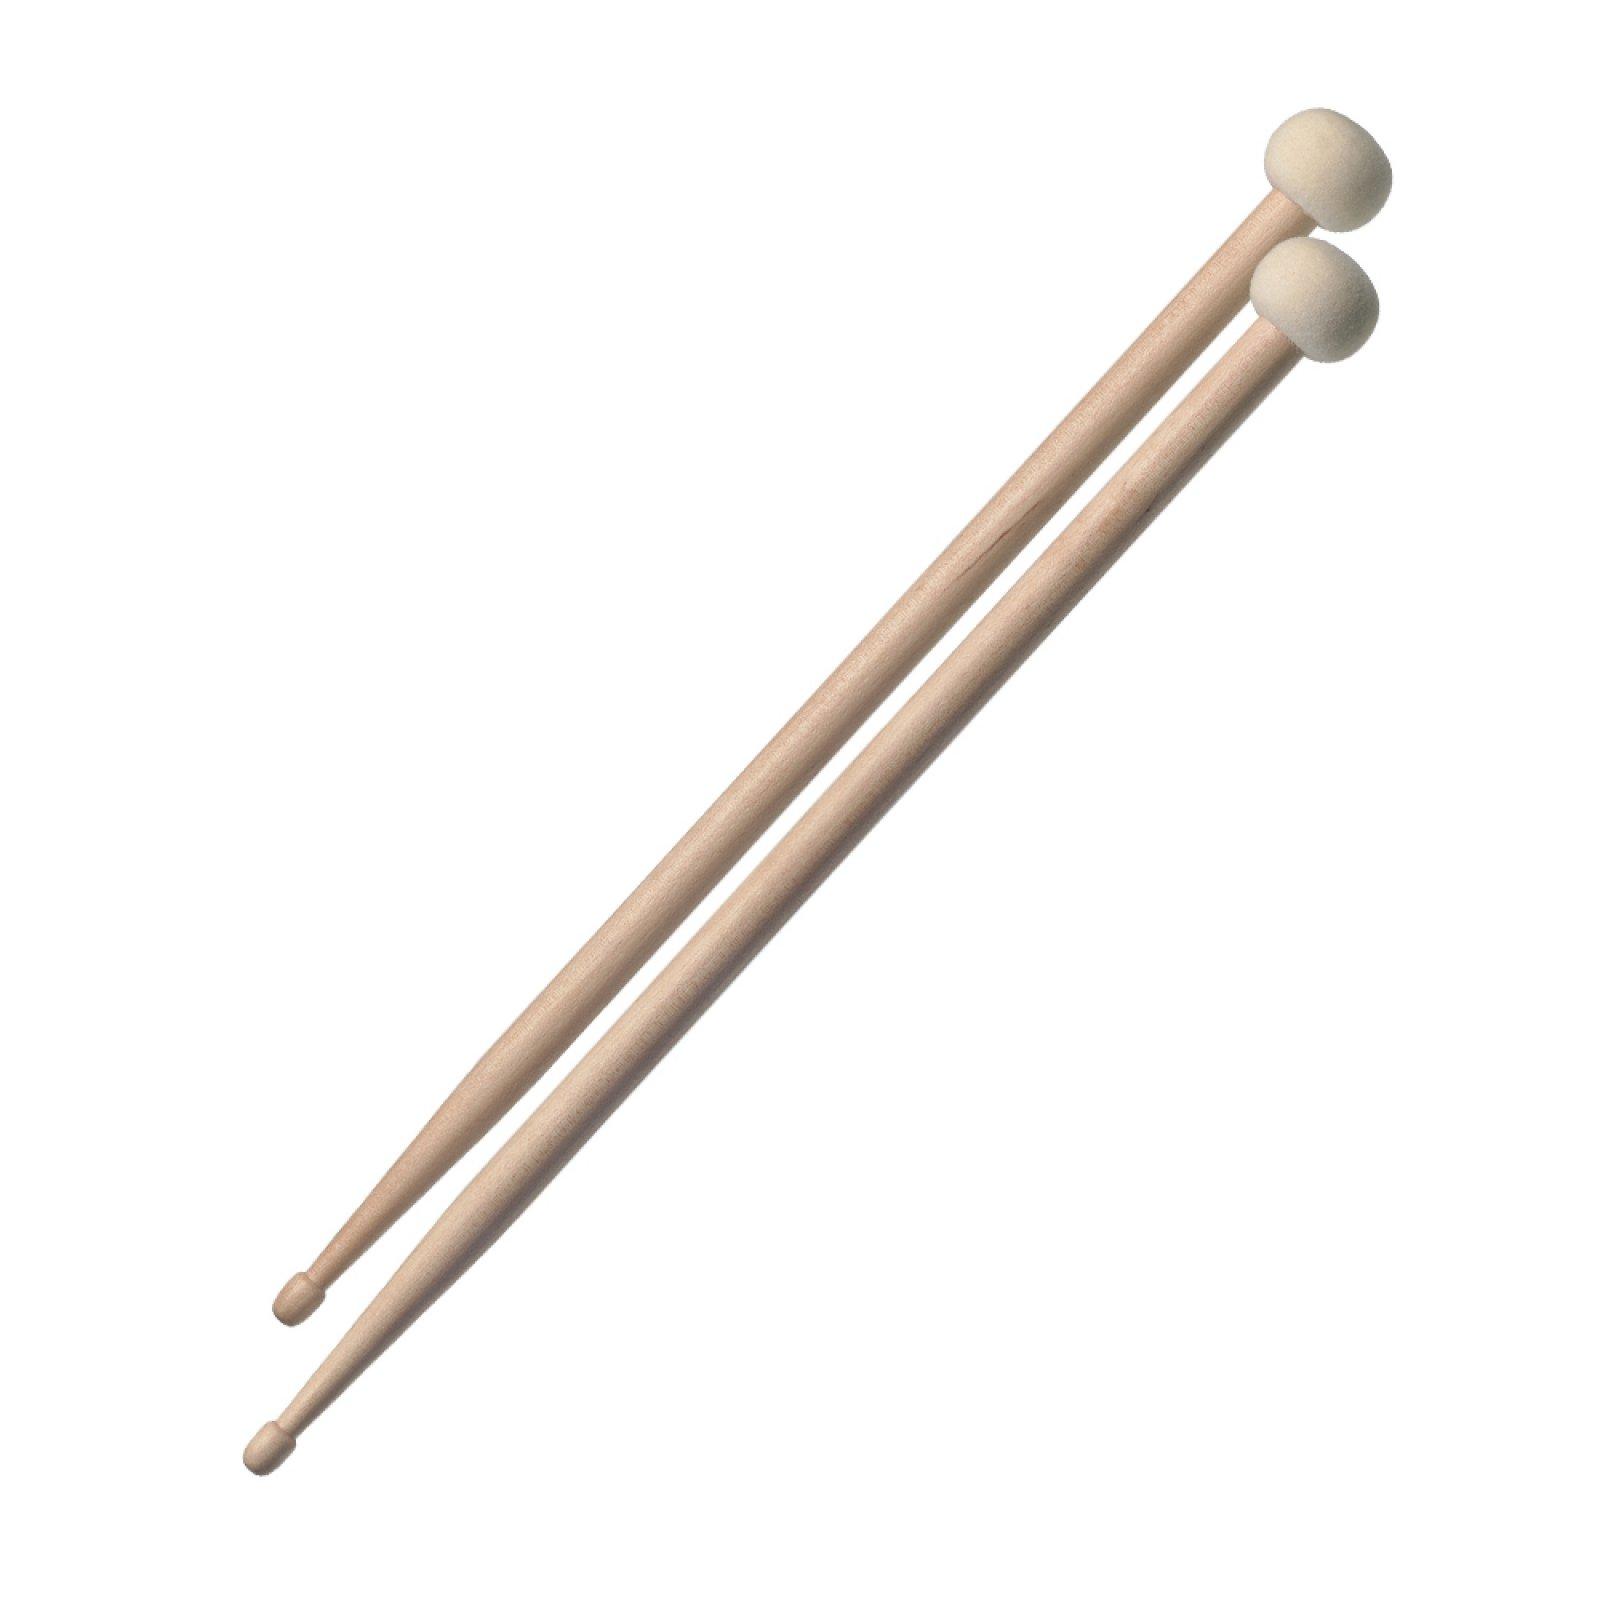 Stagg Sm5a Tim F30 Felt Tip Sticks 882030237041